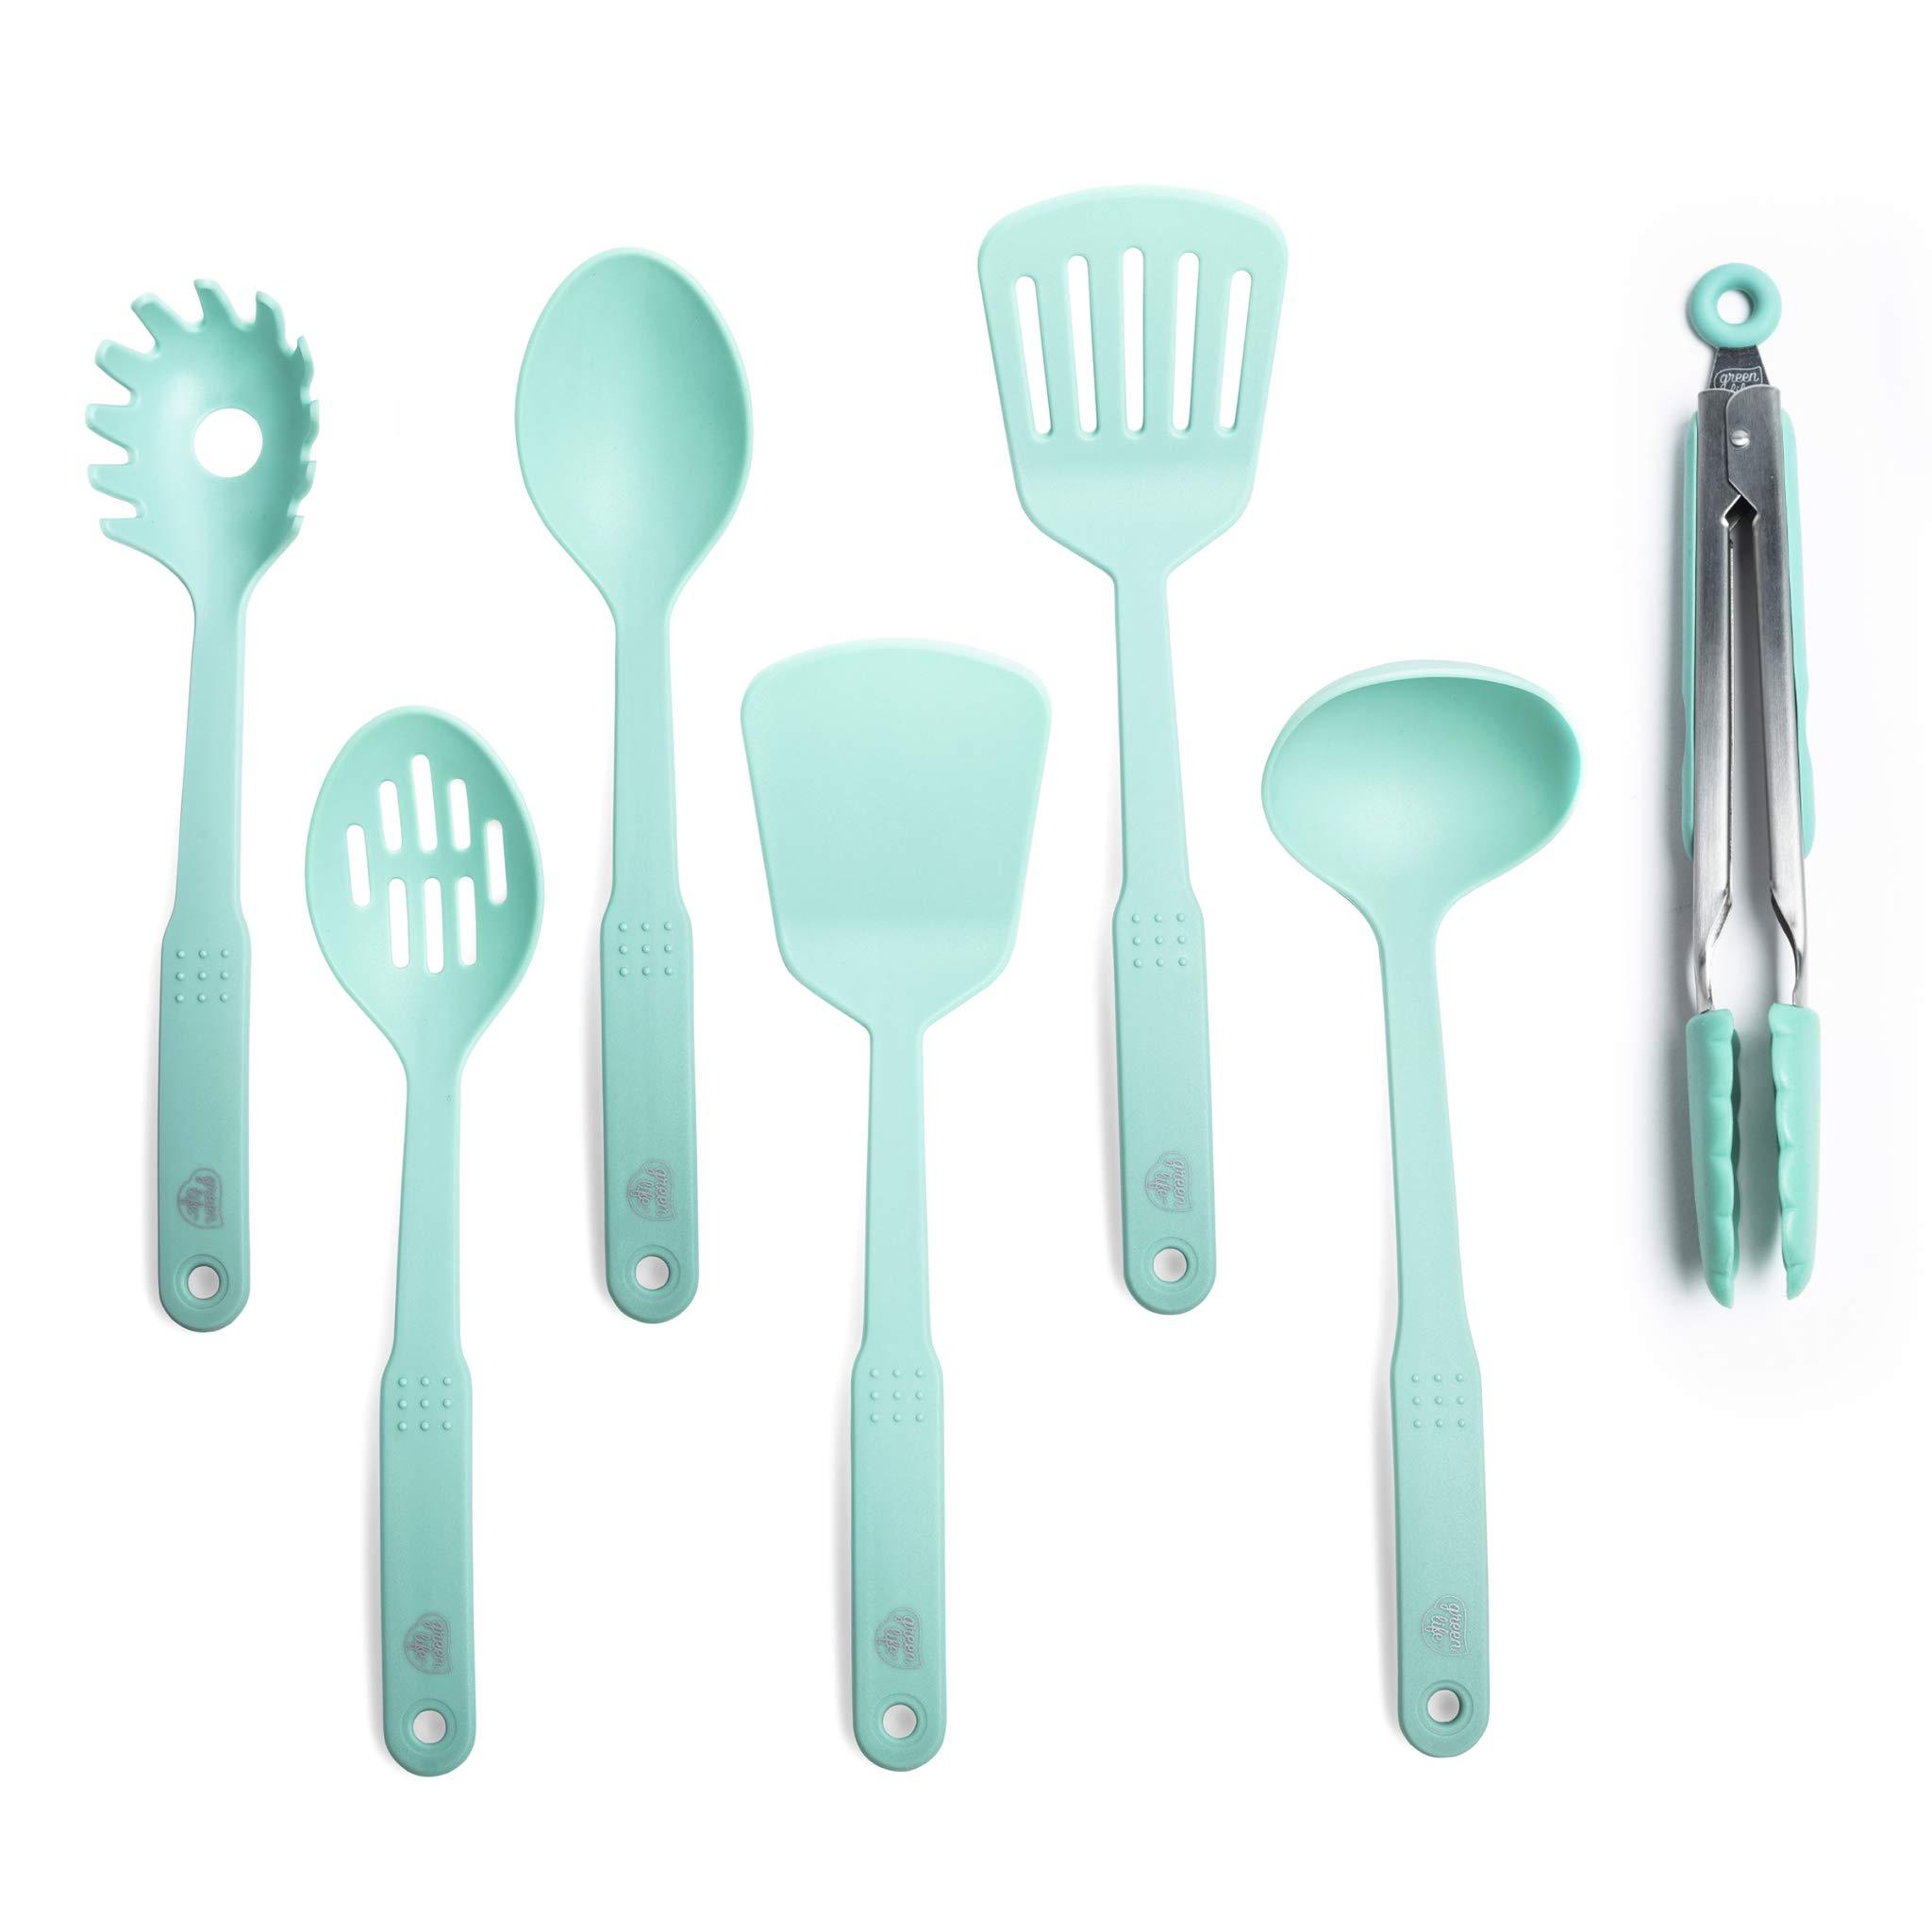 GreenLife CC001729-001 Nylon Cooking Set, 7-Piece, Turquoise, 7pc Utensil, Turqouise